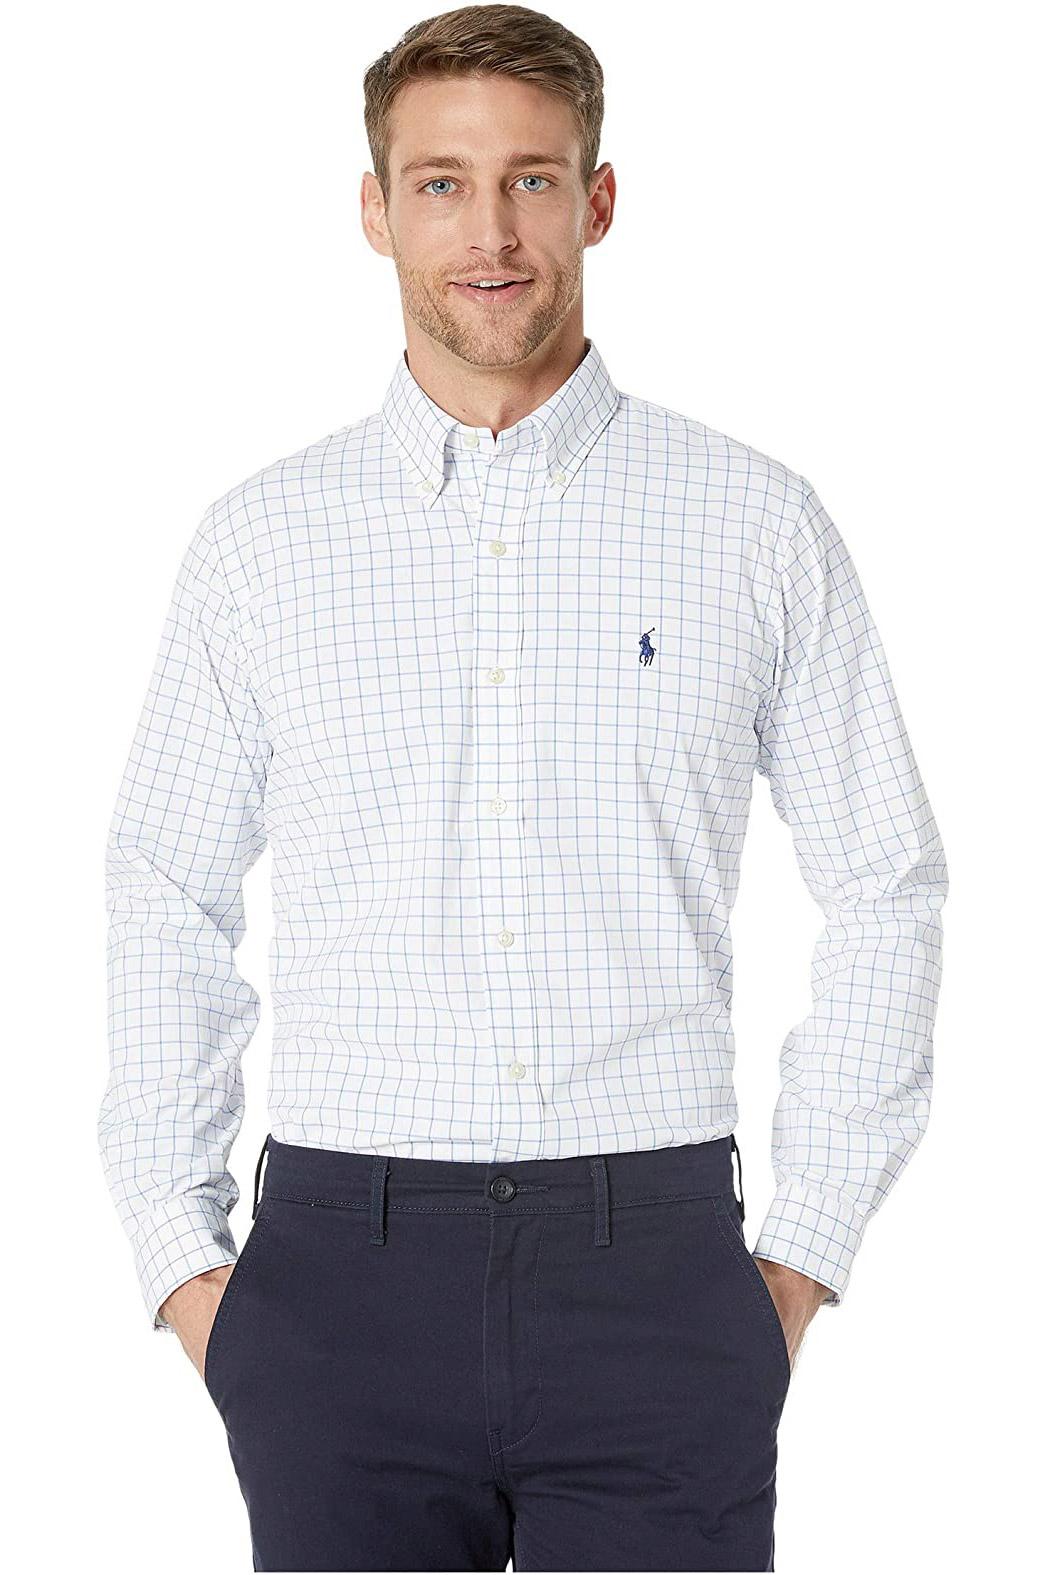 Camisa Ralph Lauren Masculina Custom Fit Tattersall Branco